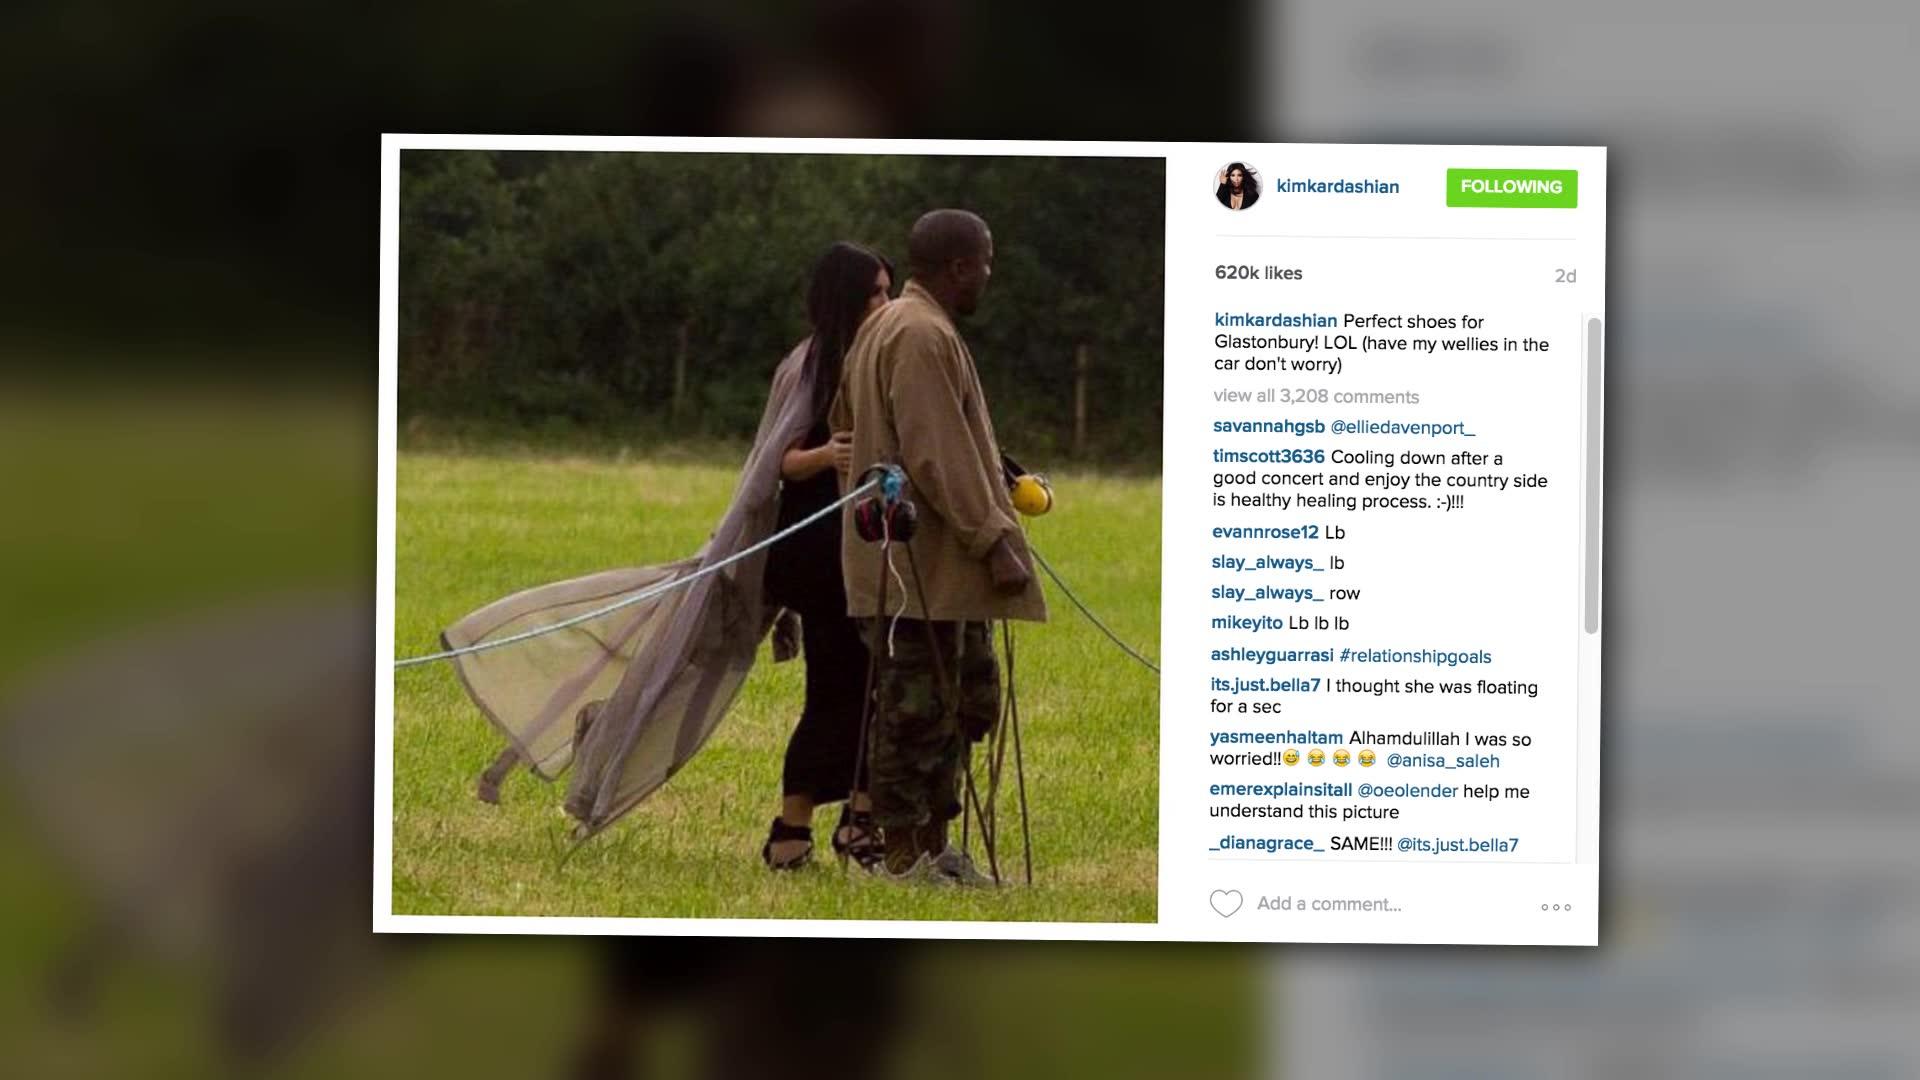 Kanye West And Kim Kardashian Lead The Glastonbury Fash Pack